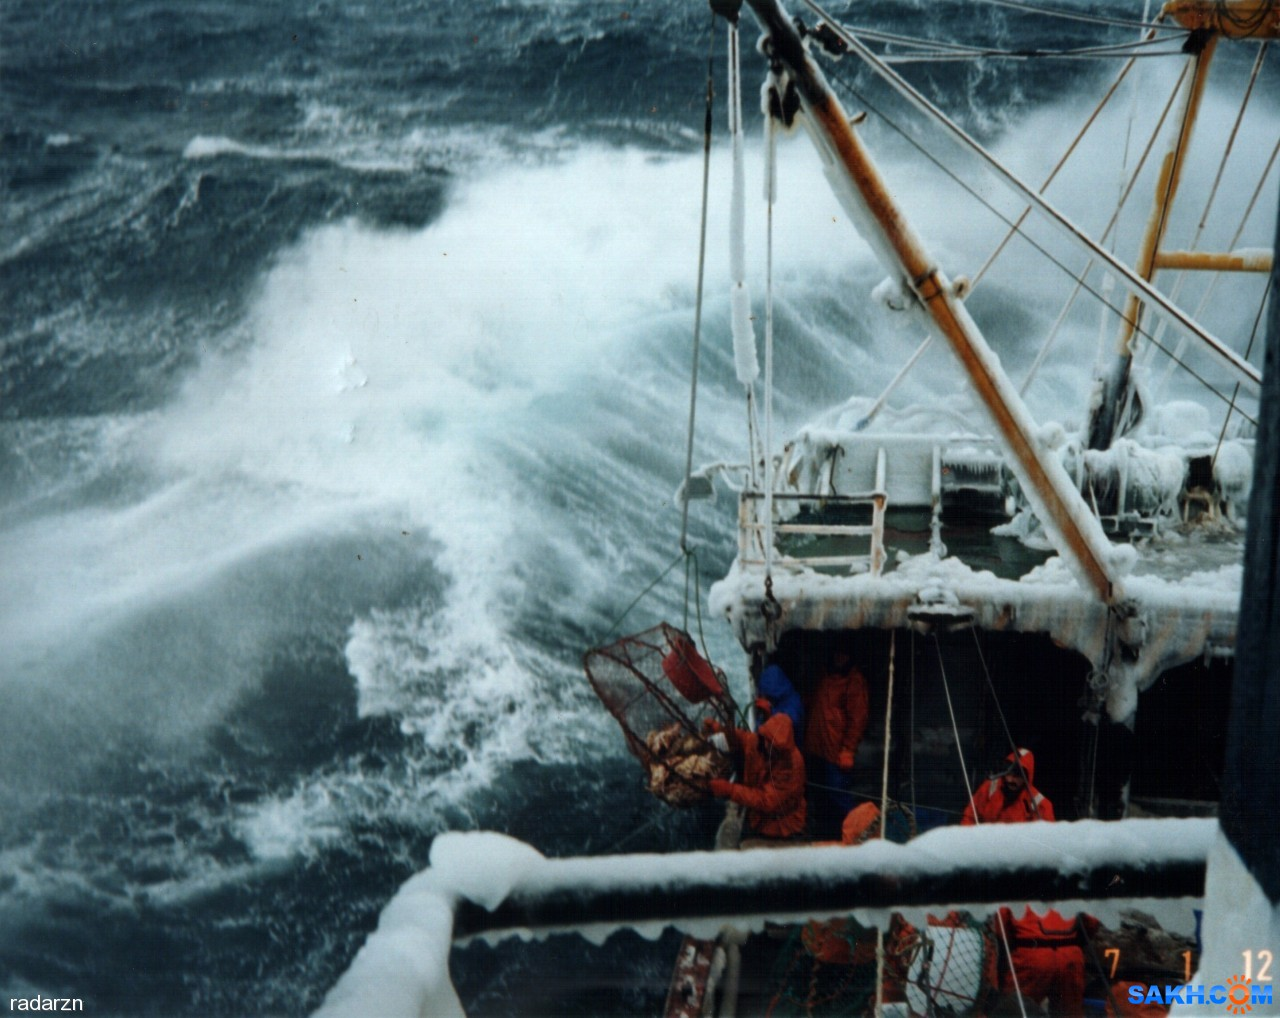 radarzn: ФОРЕВЕР. Не лёгкий труд Сахалинских рыбаков